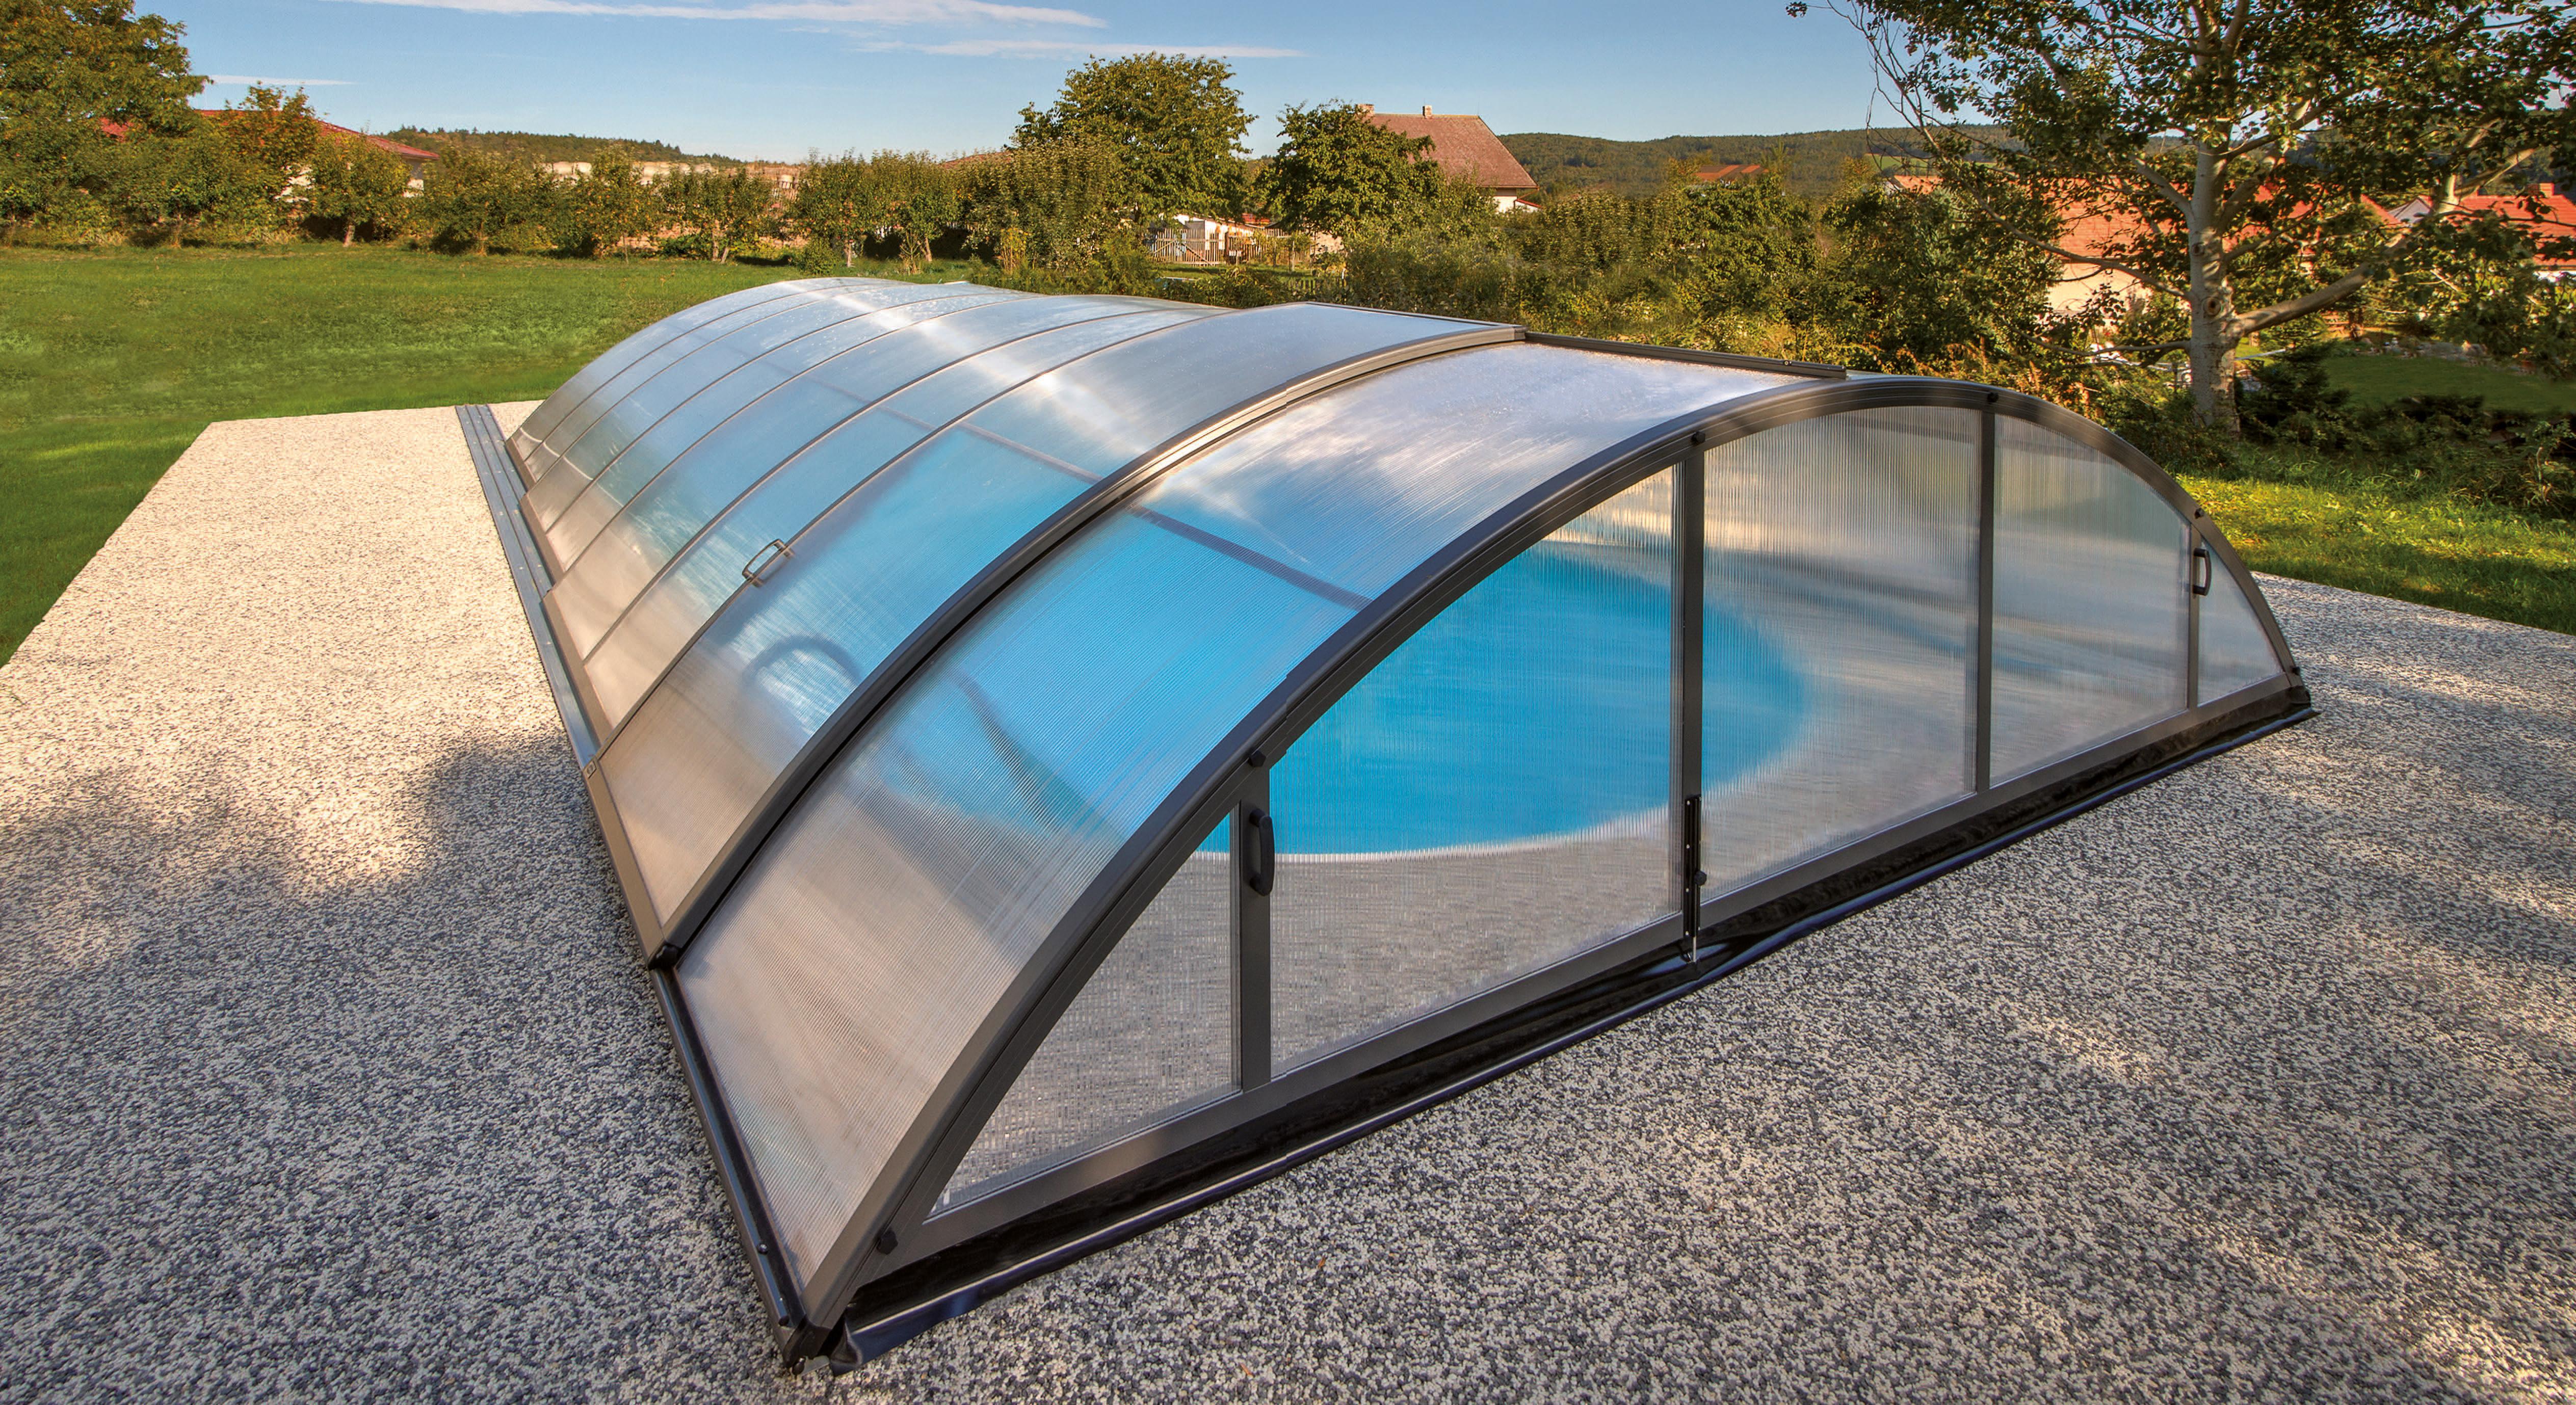 schwimmbad berdachung klasik a fkb schwimmbadtechnik. Black Bedroom Furniture Sets. Home Design Ideas